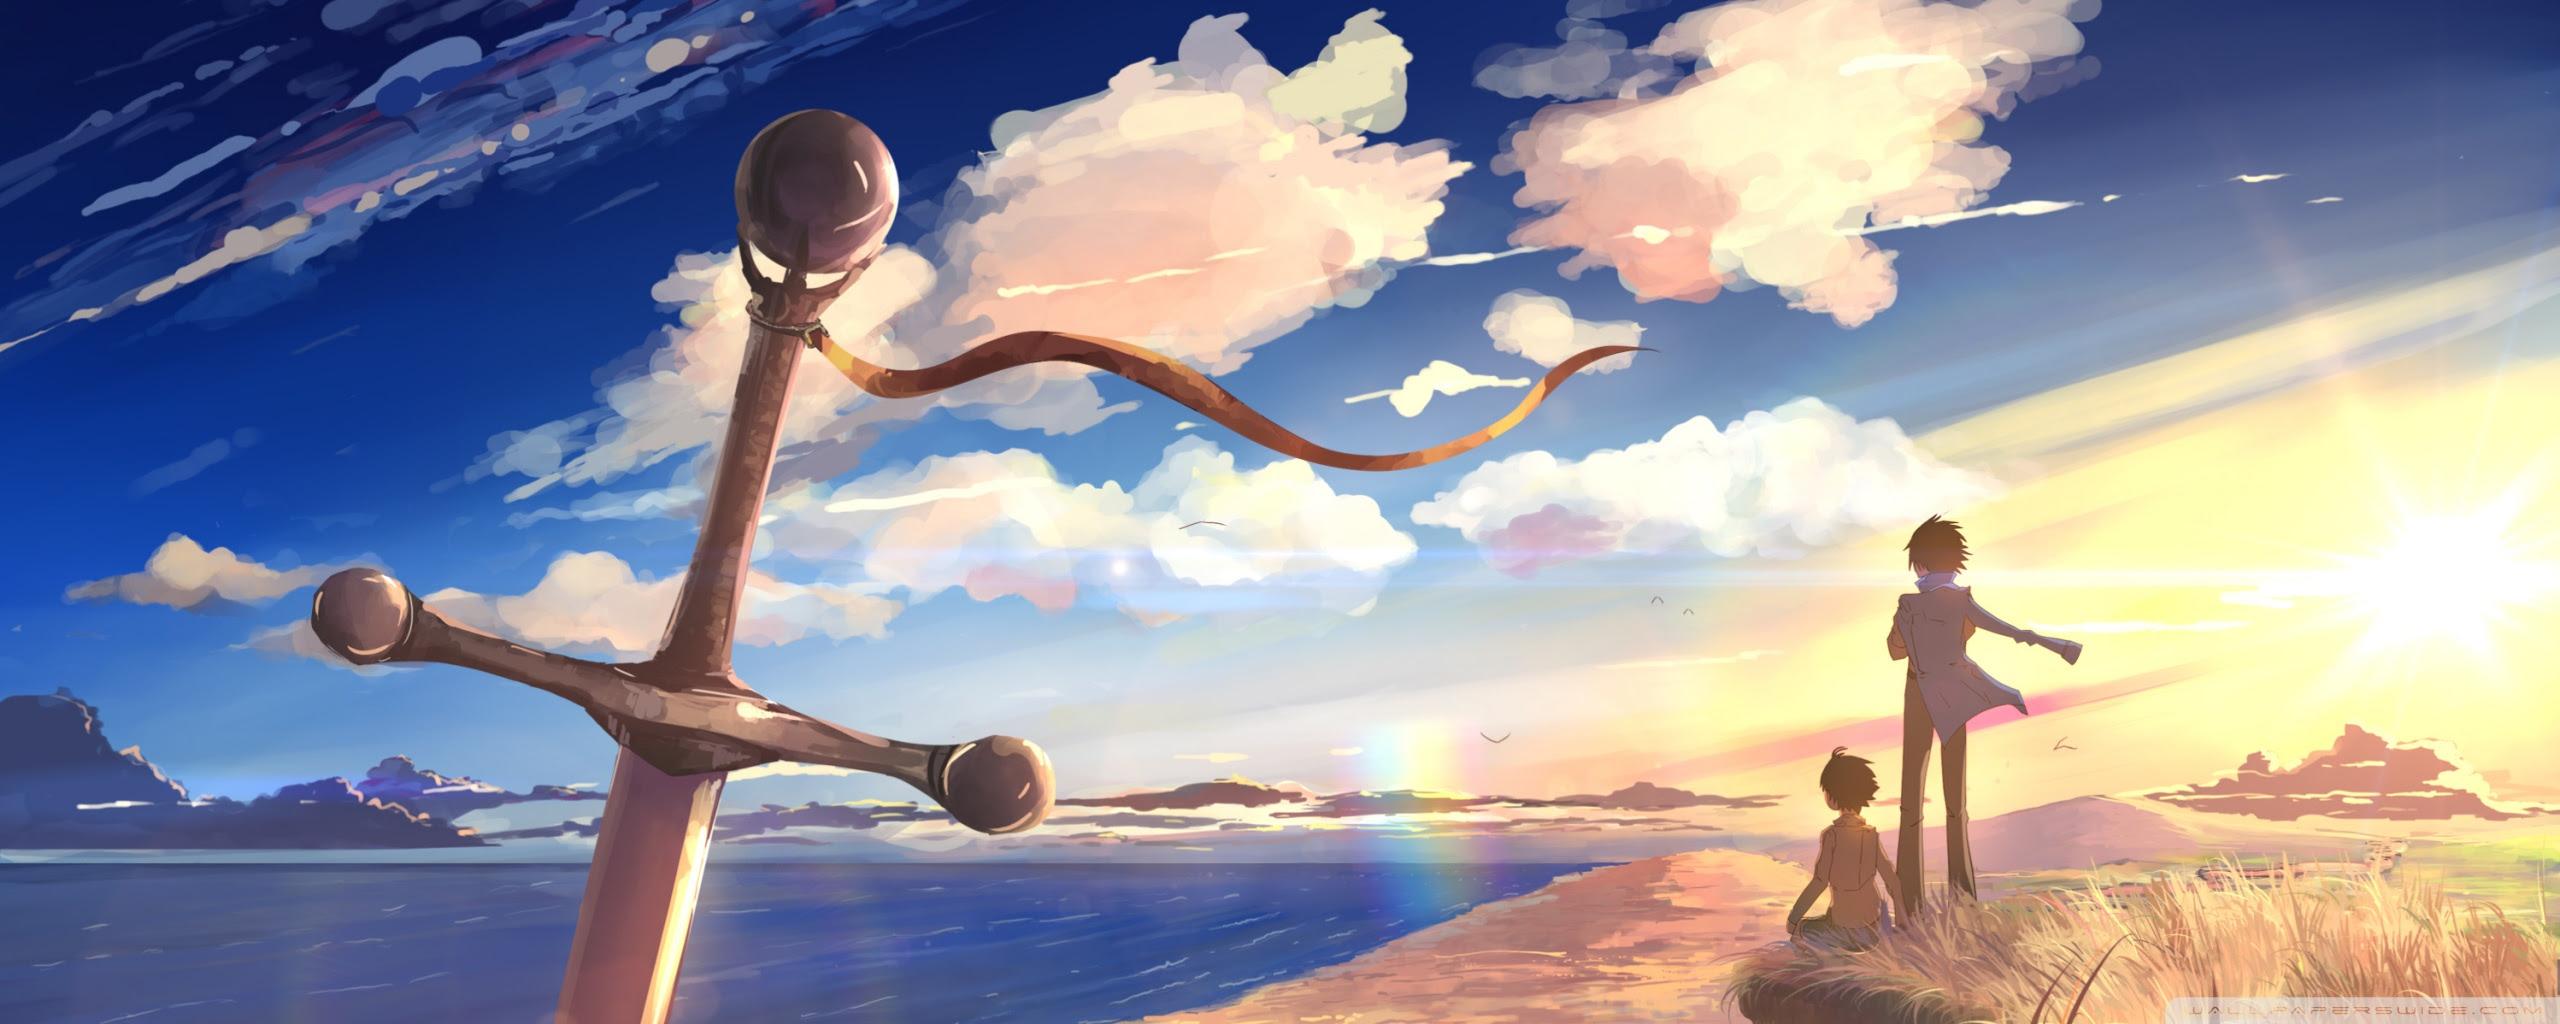 12+ Anime 1080p Dual Monitor Wallpaper